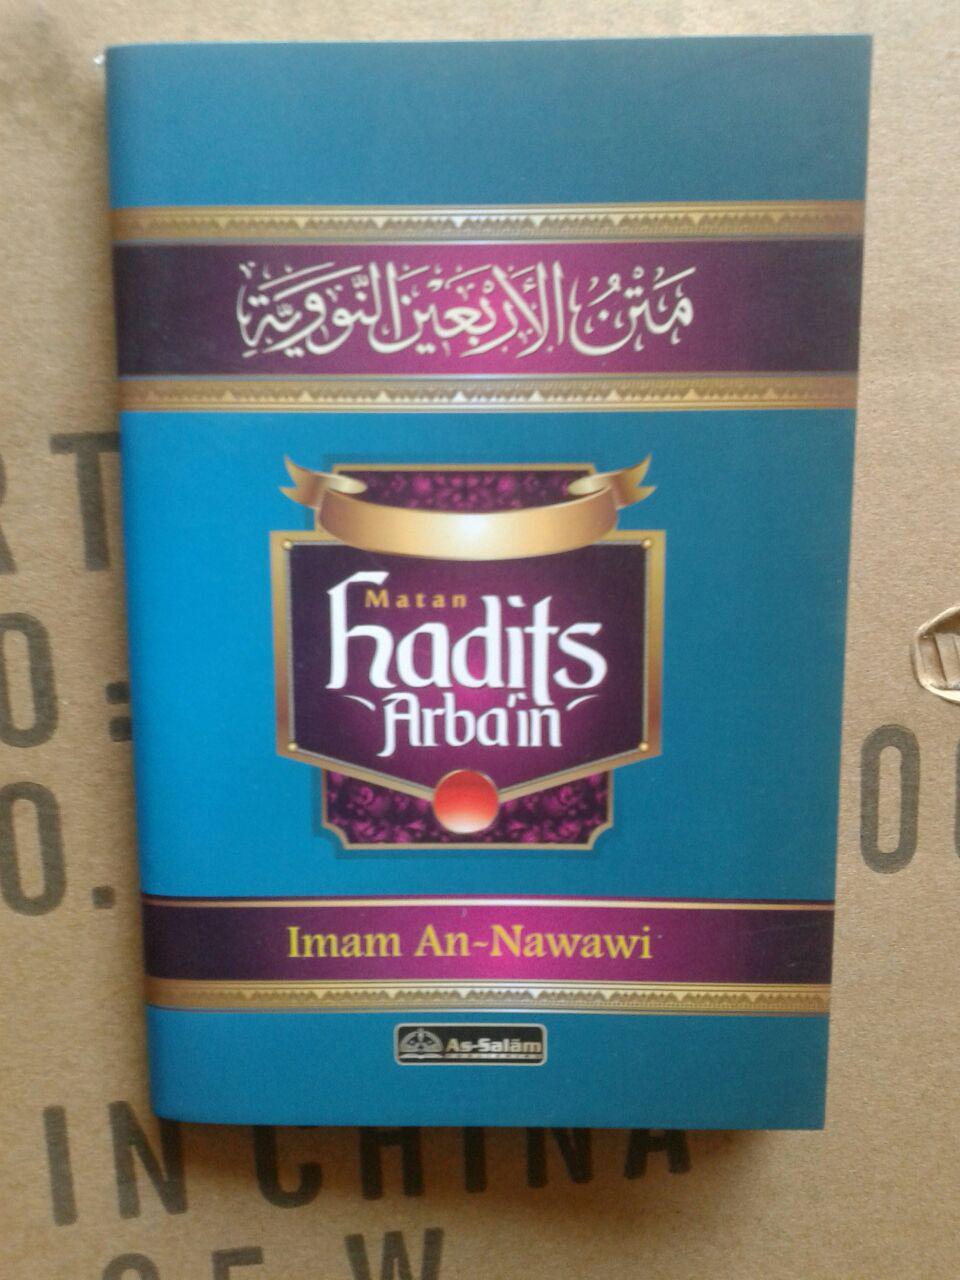 Buku Saku Matan Hadits Arbain Imam An-Nawawi cover